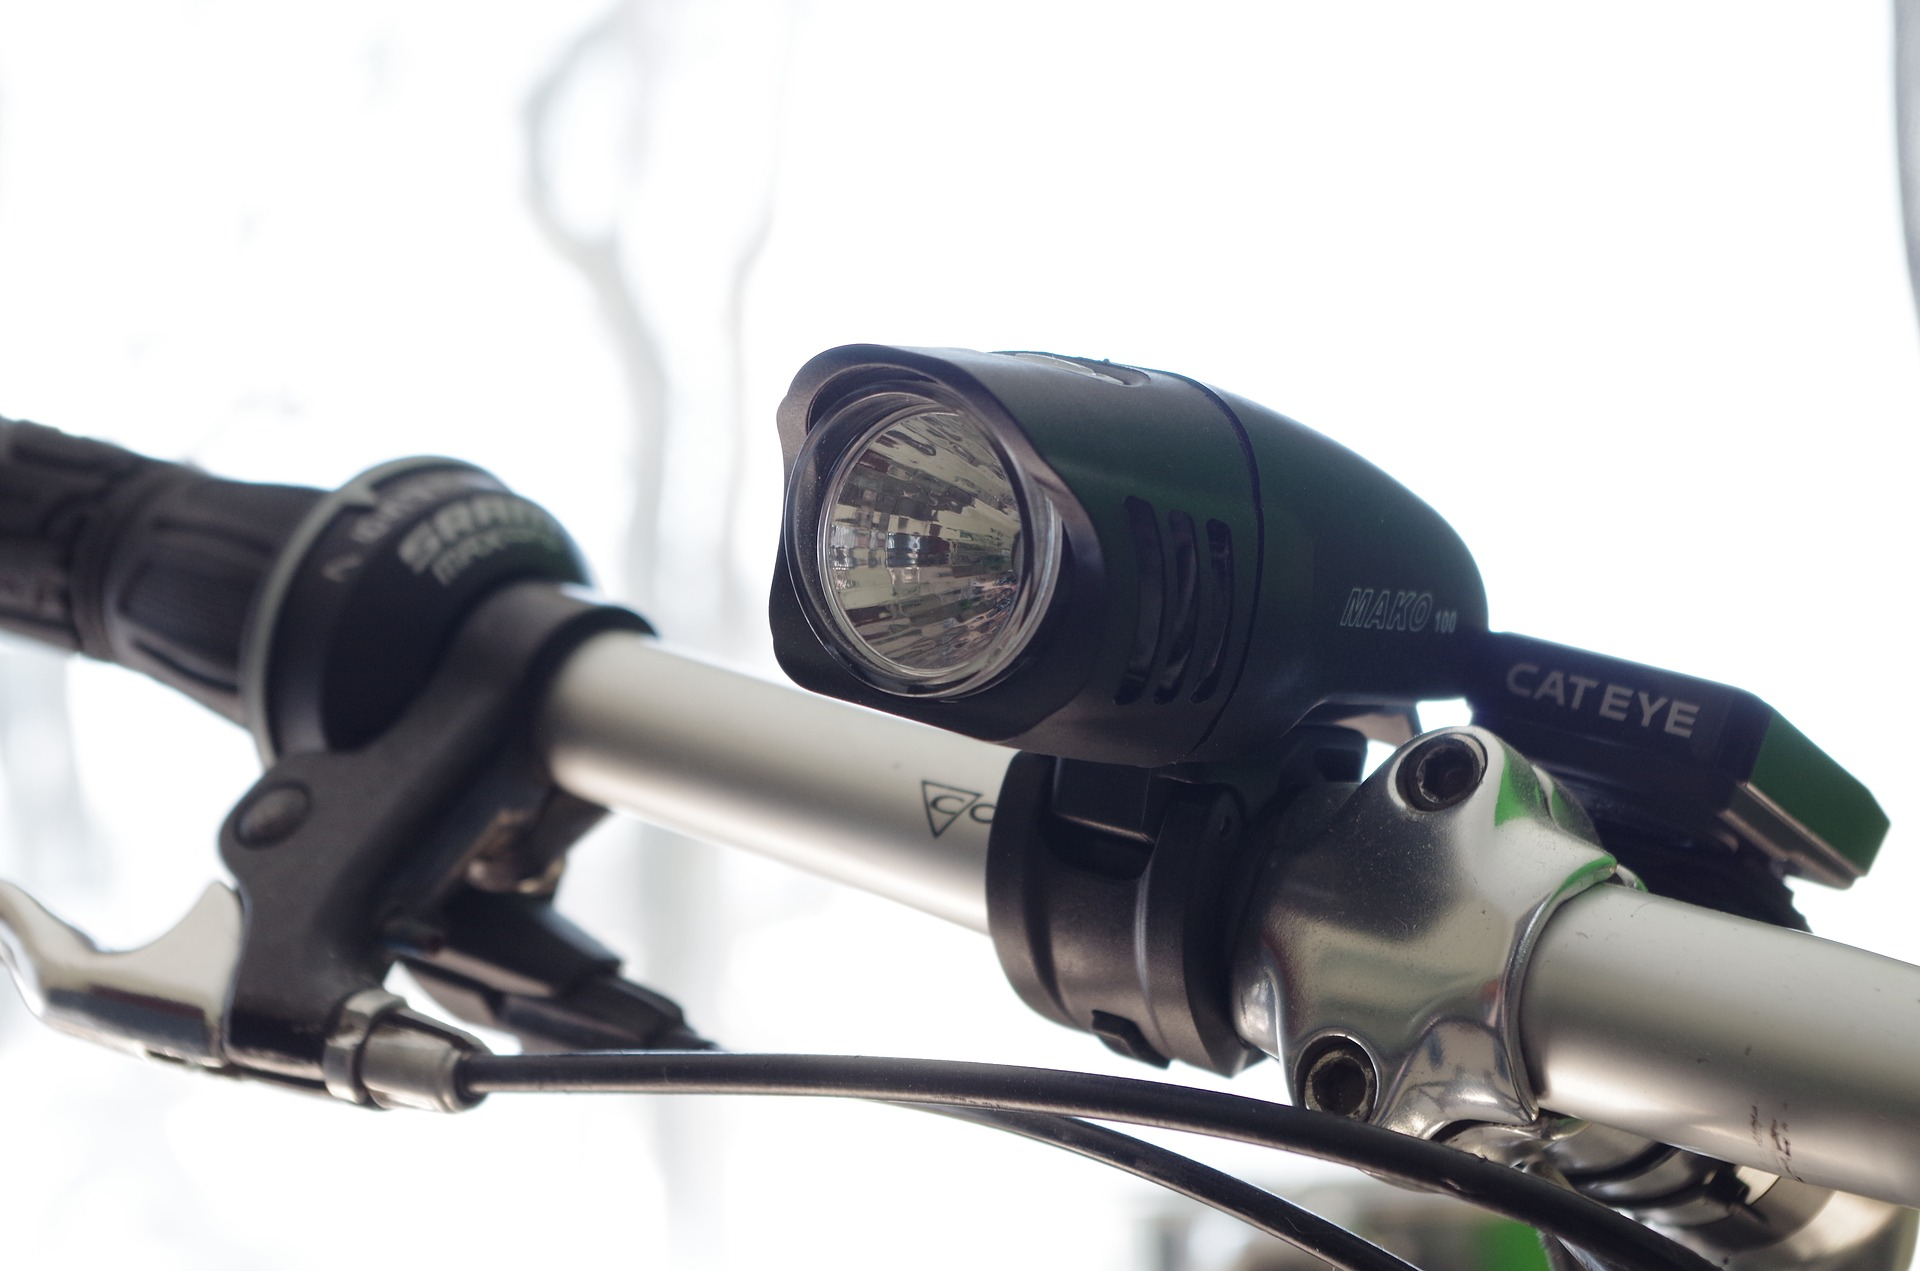 LED Fahrradlampe: Test & Empfehlungen (03/21)